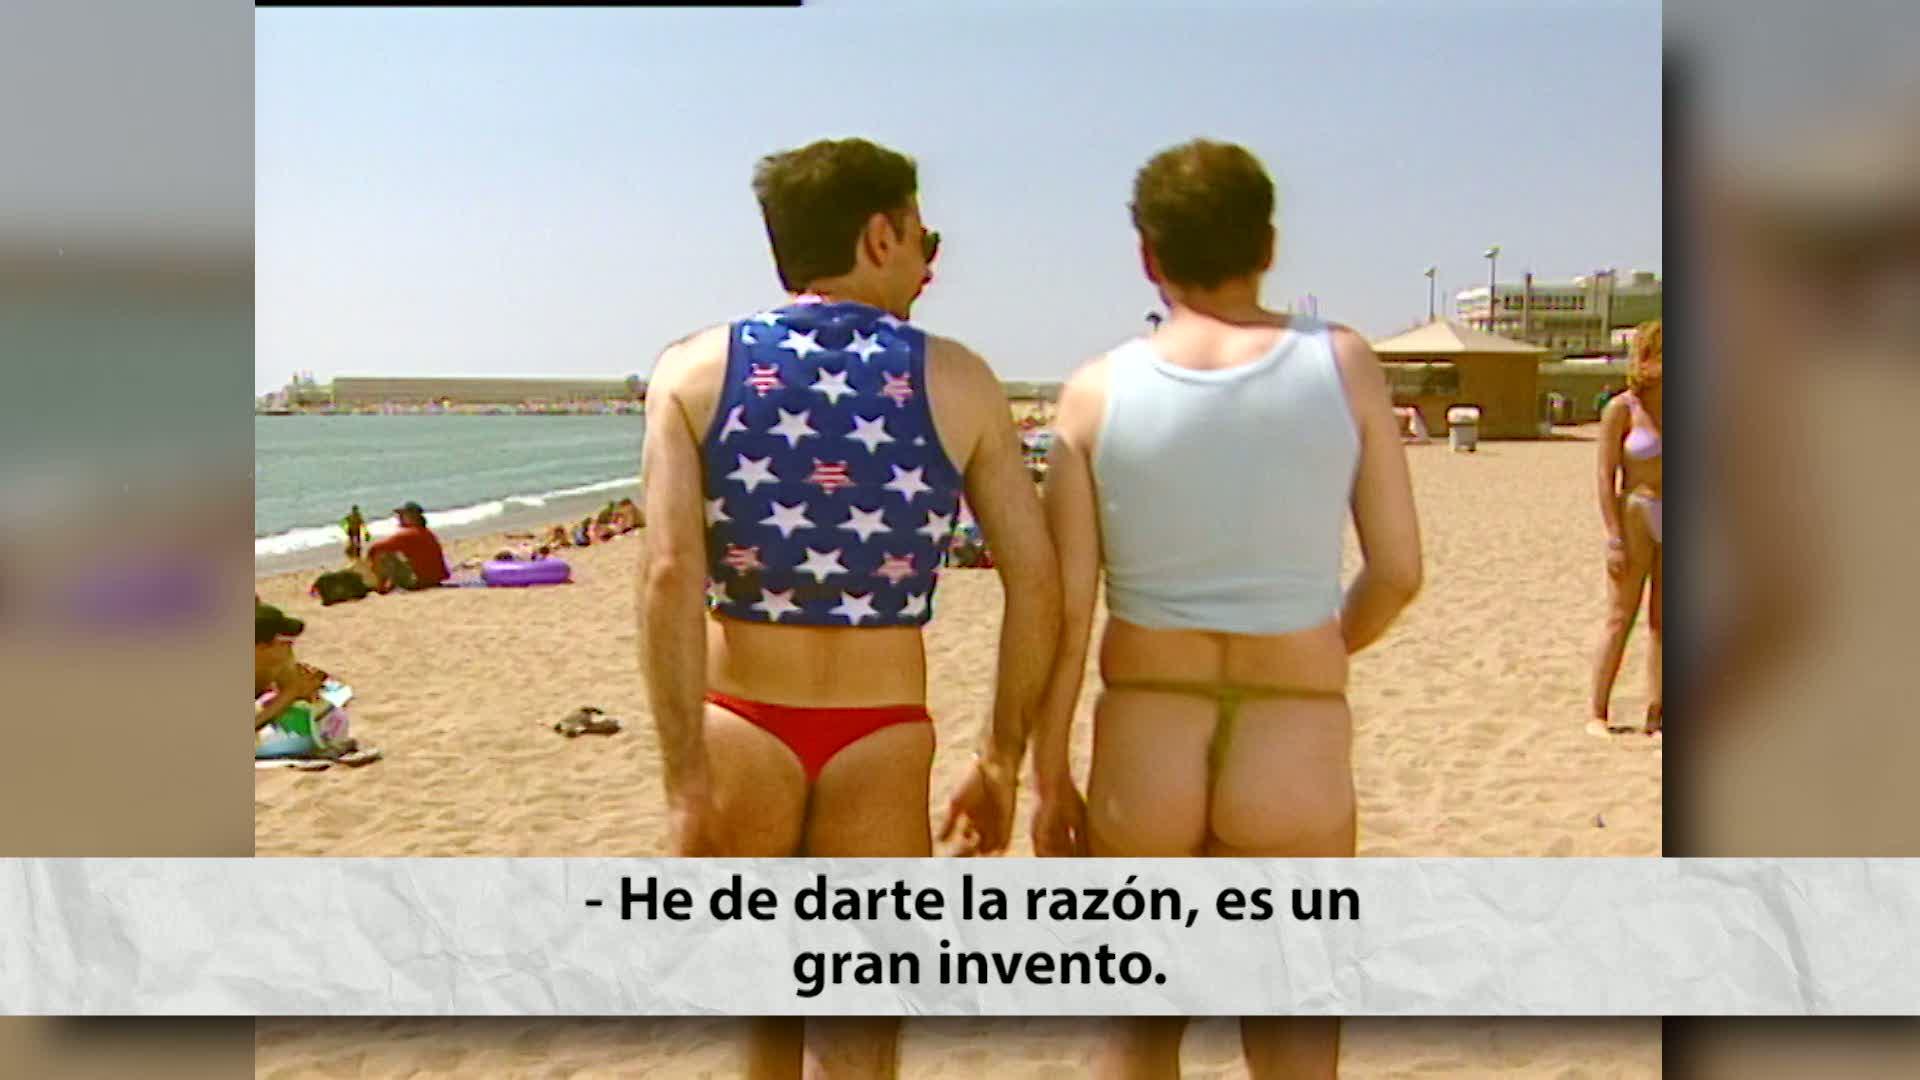 Hora Punta - Nos encanta el papel de Jordi Sánchez en la serie Plats Bruts . ¡Menudo baile en tanga se marcó!